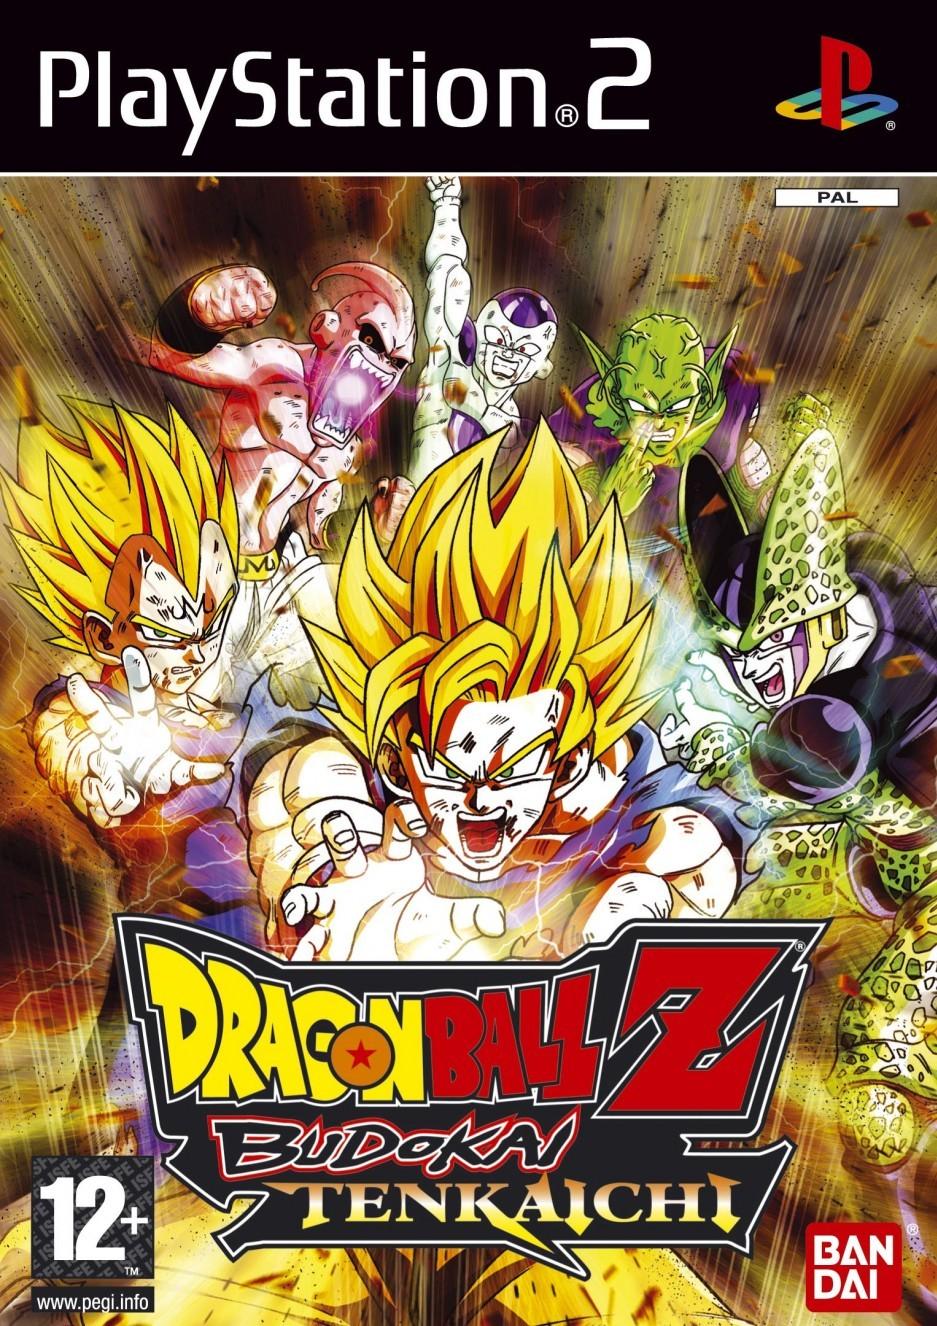 Test dbz budokai tenkaichi - Dragon ball z 4 ...